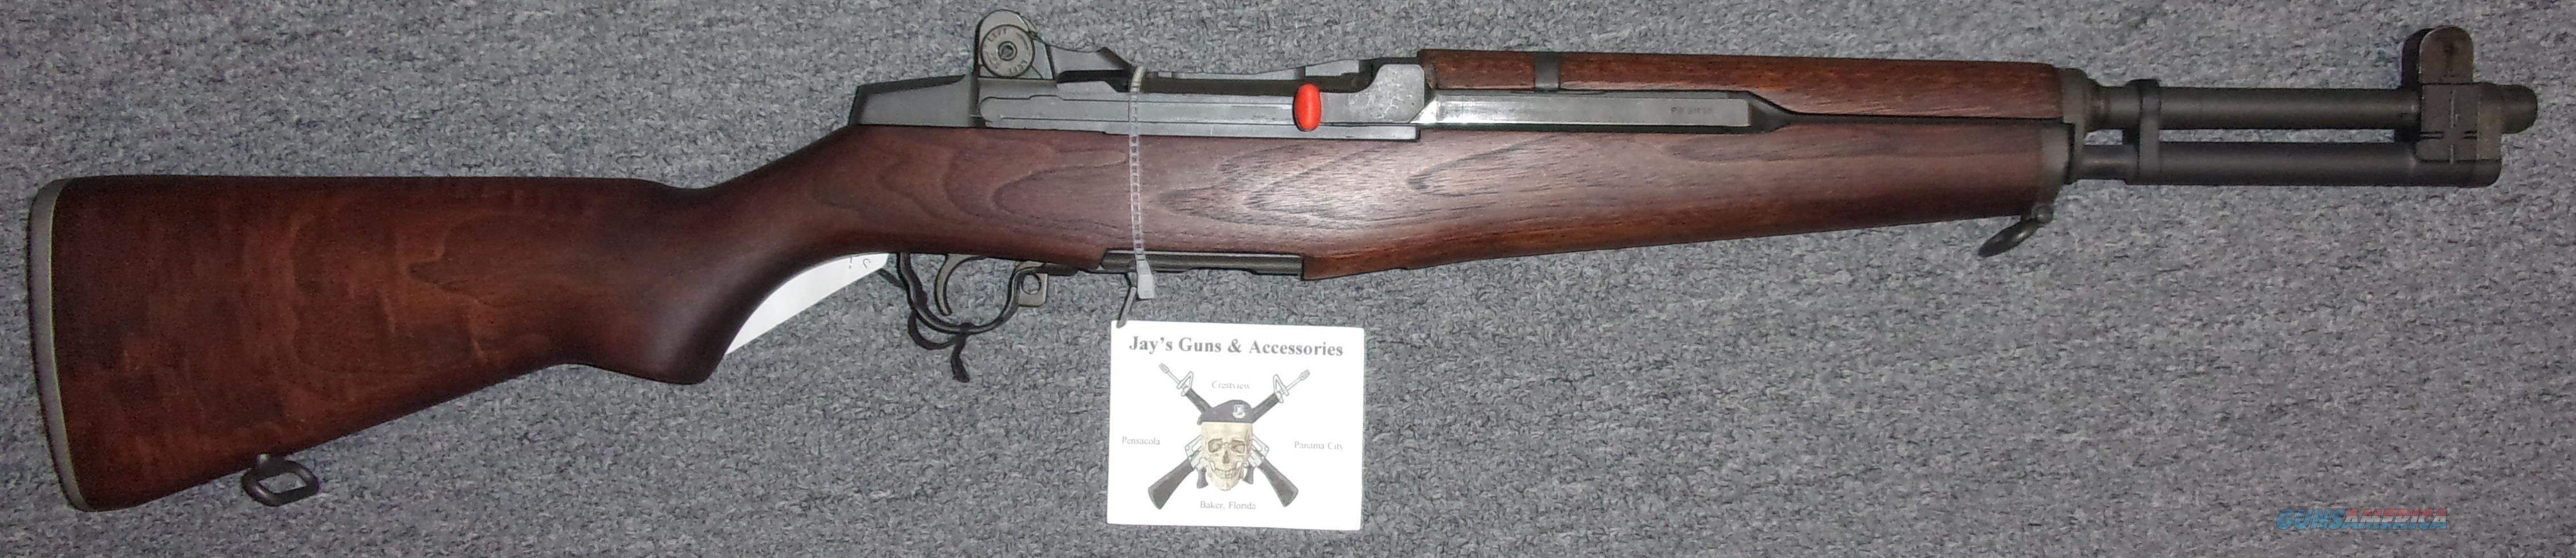 James River Armory XM1E2 (Beretta BM59 Carbine Clone)  Guns > Rifles > Military Misc. Rifles US > M1A/M14